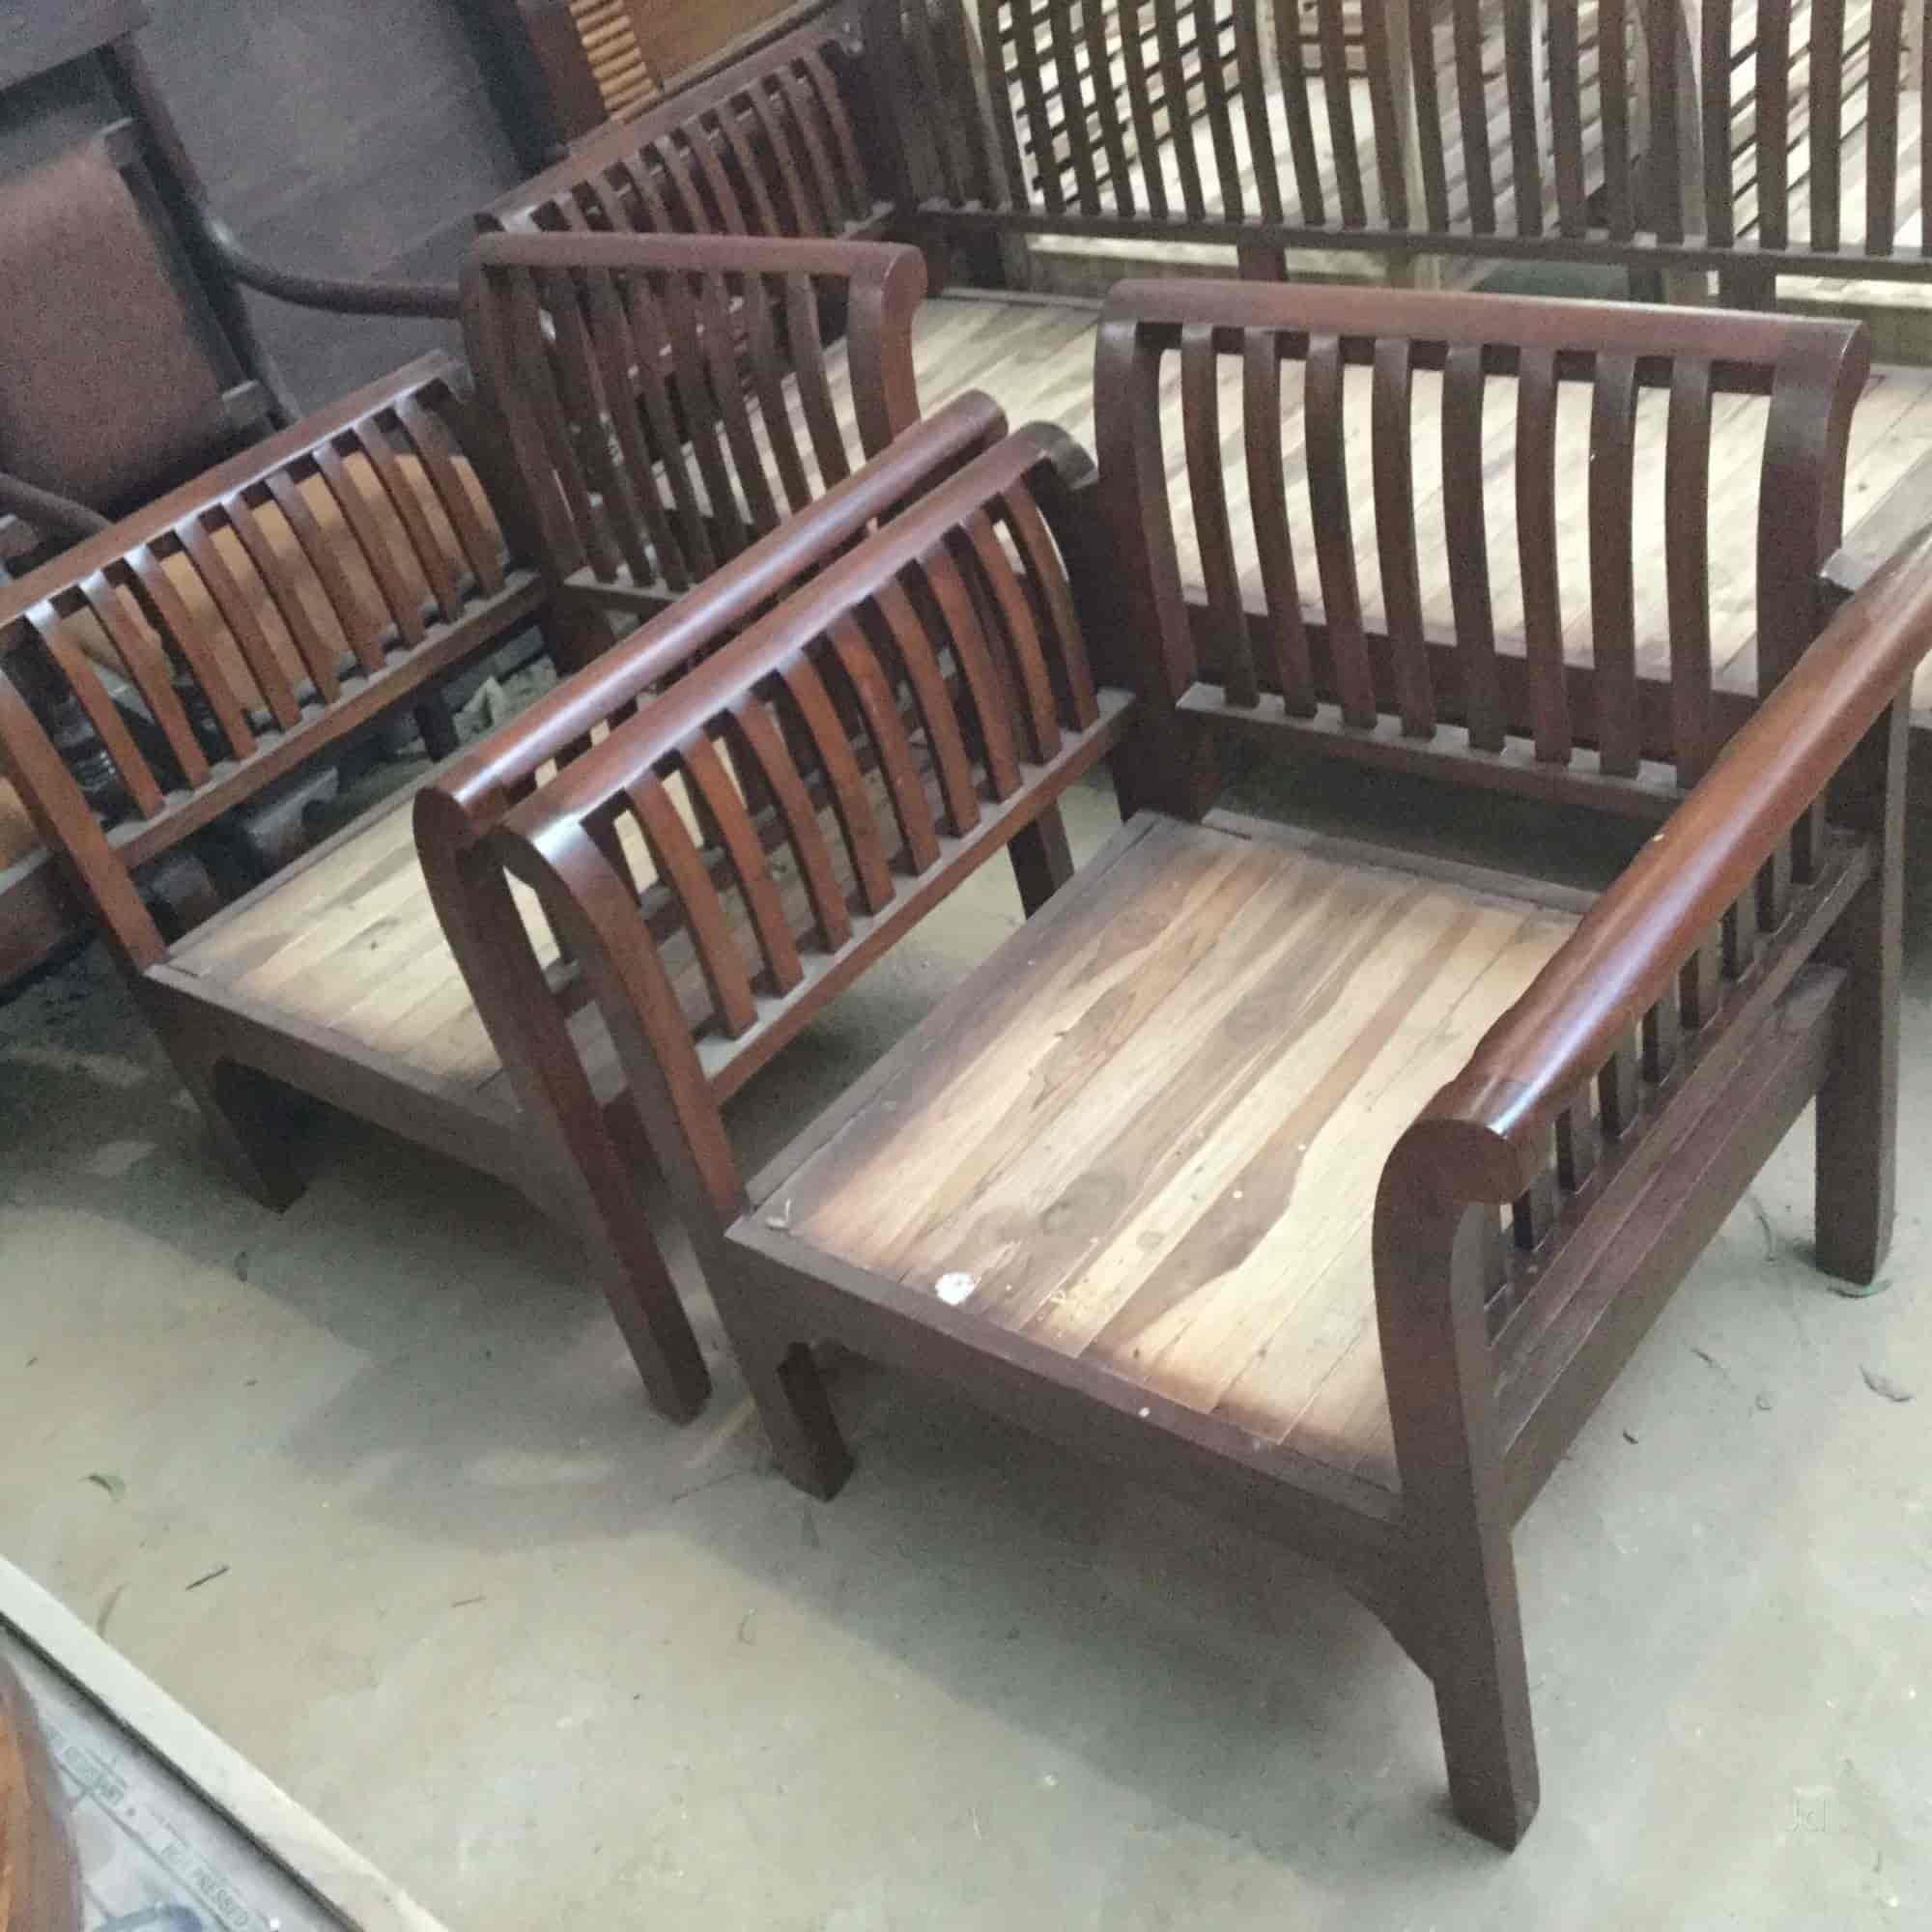 ... Furniture   Ankit Furniture House Photos, Sikanderpur Ghosi, Gurgaon   Second  Hand Furniture Buyers ...